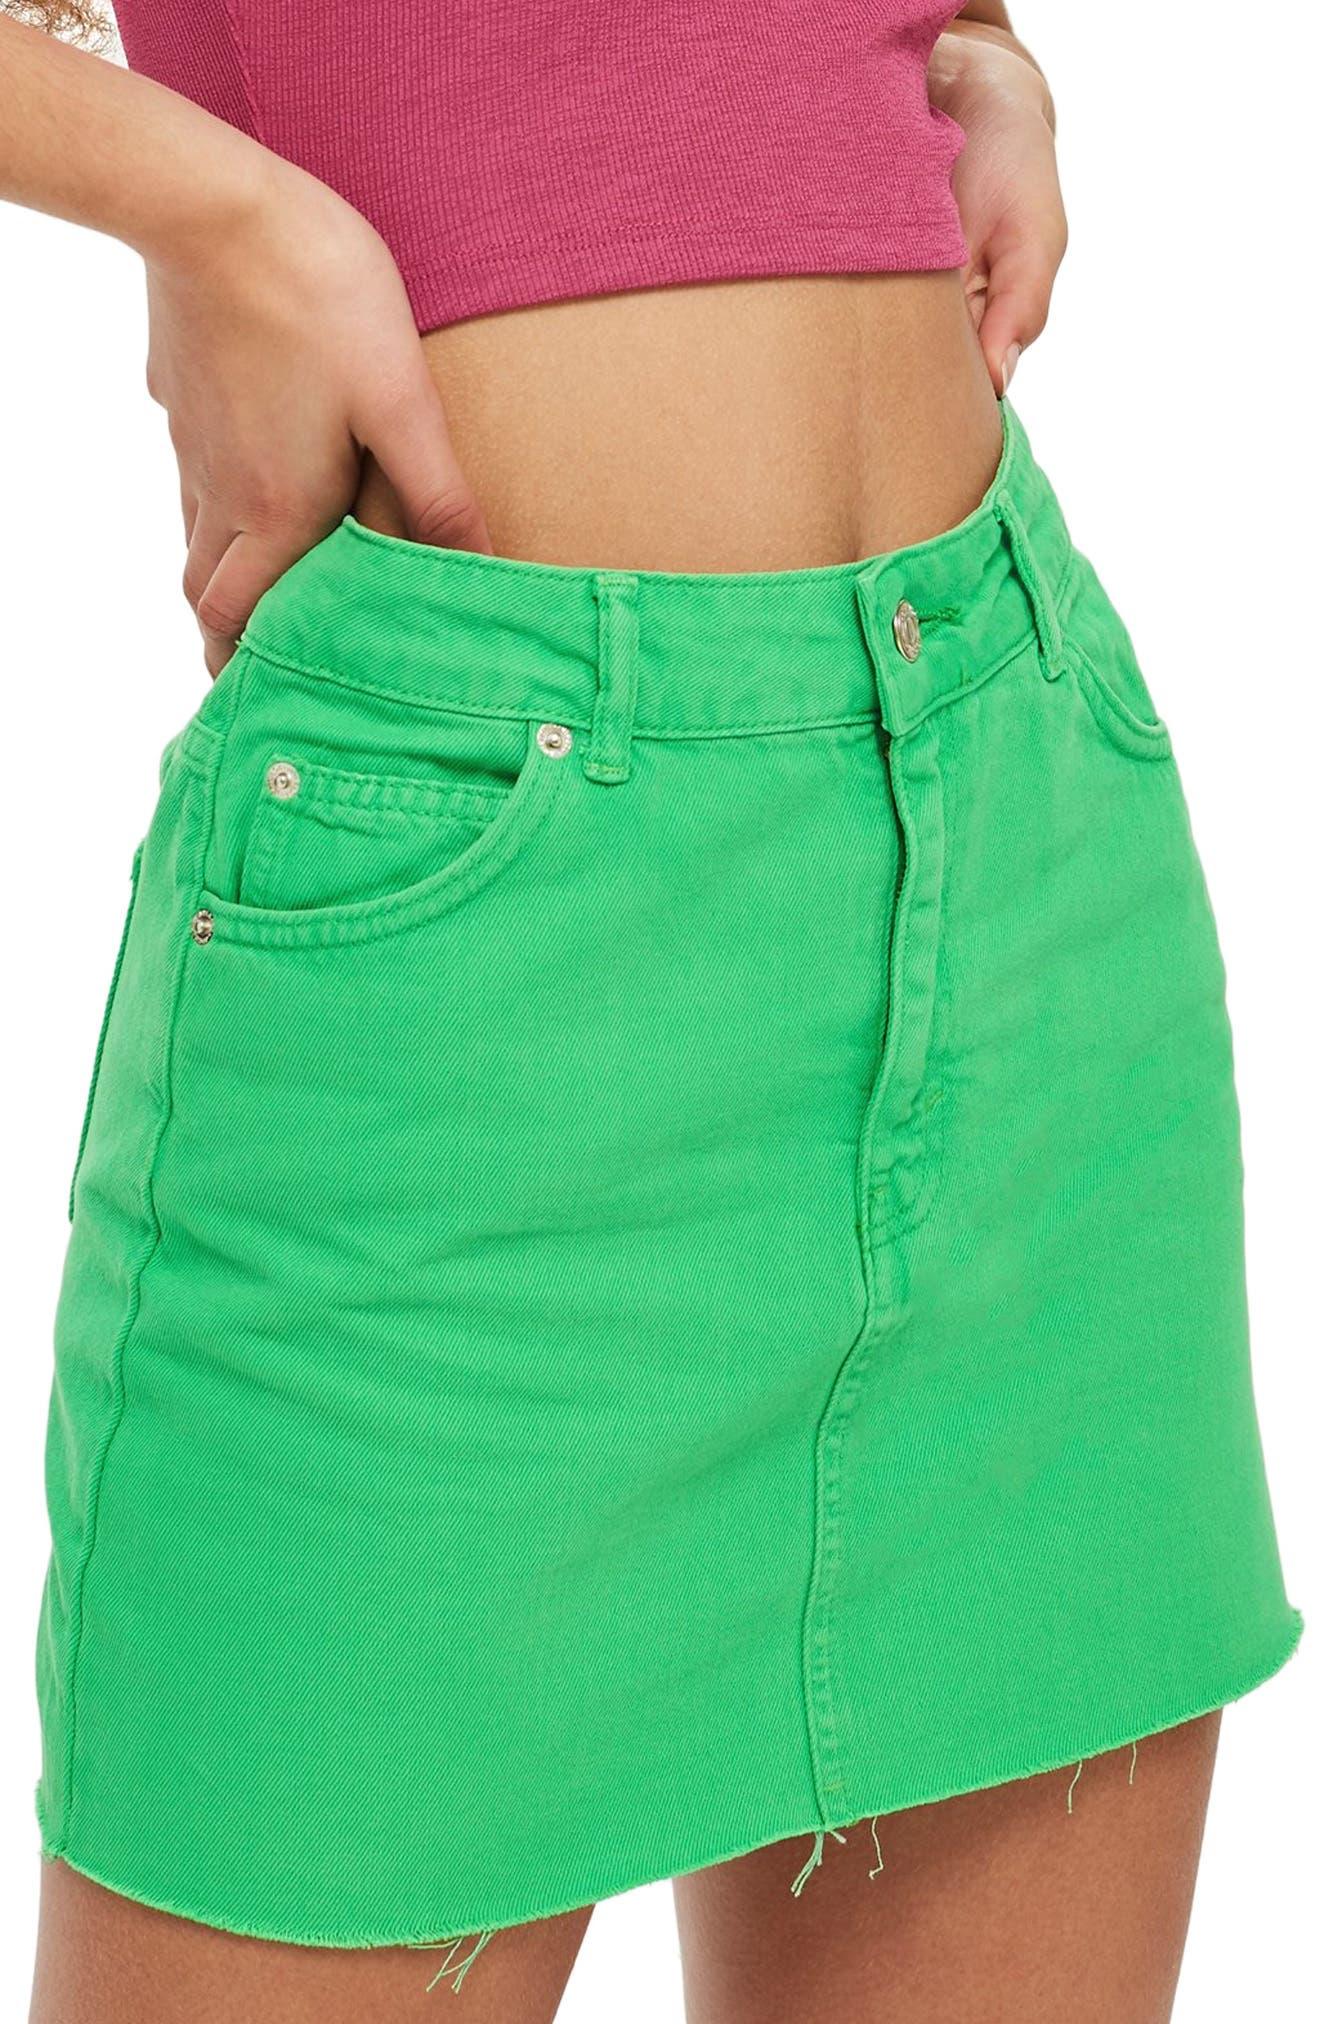 MOTO High Waist Denim Skirt,                         Main,                         color, 320